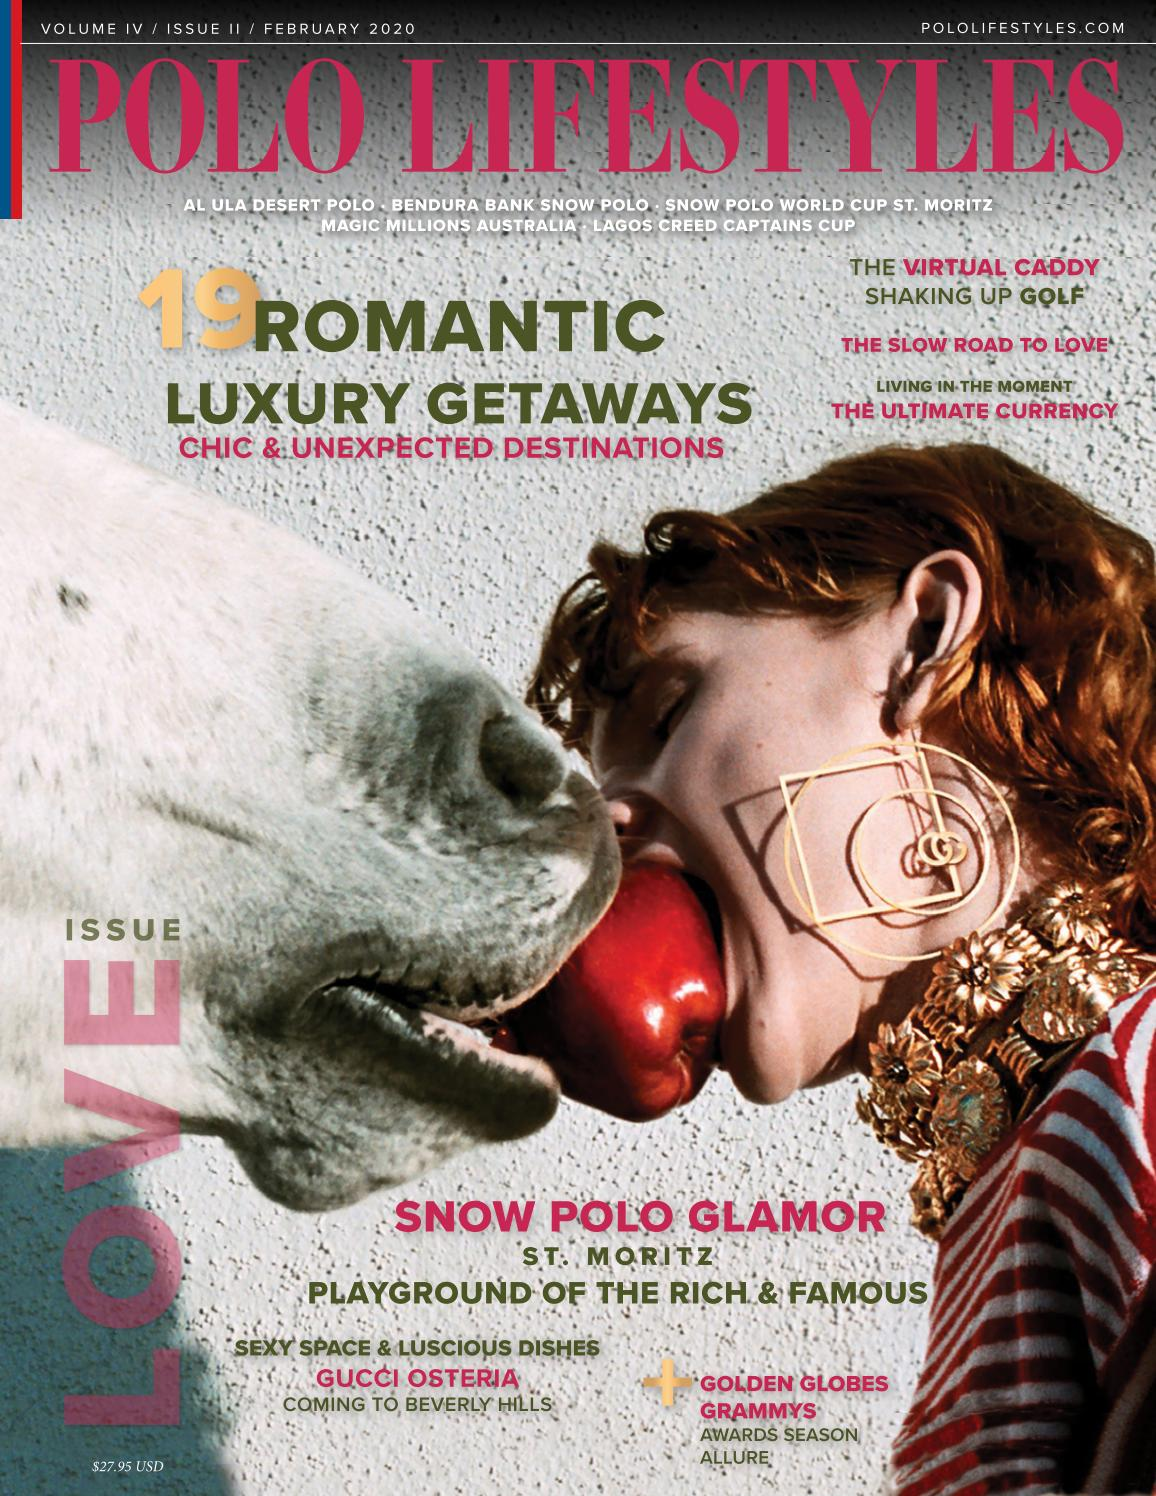 Deco Tonneau De Vin polo lifestyles february 2020 - snow polo & weekend romance